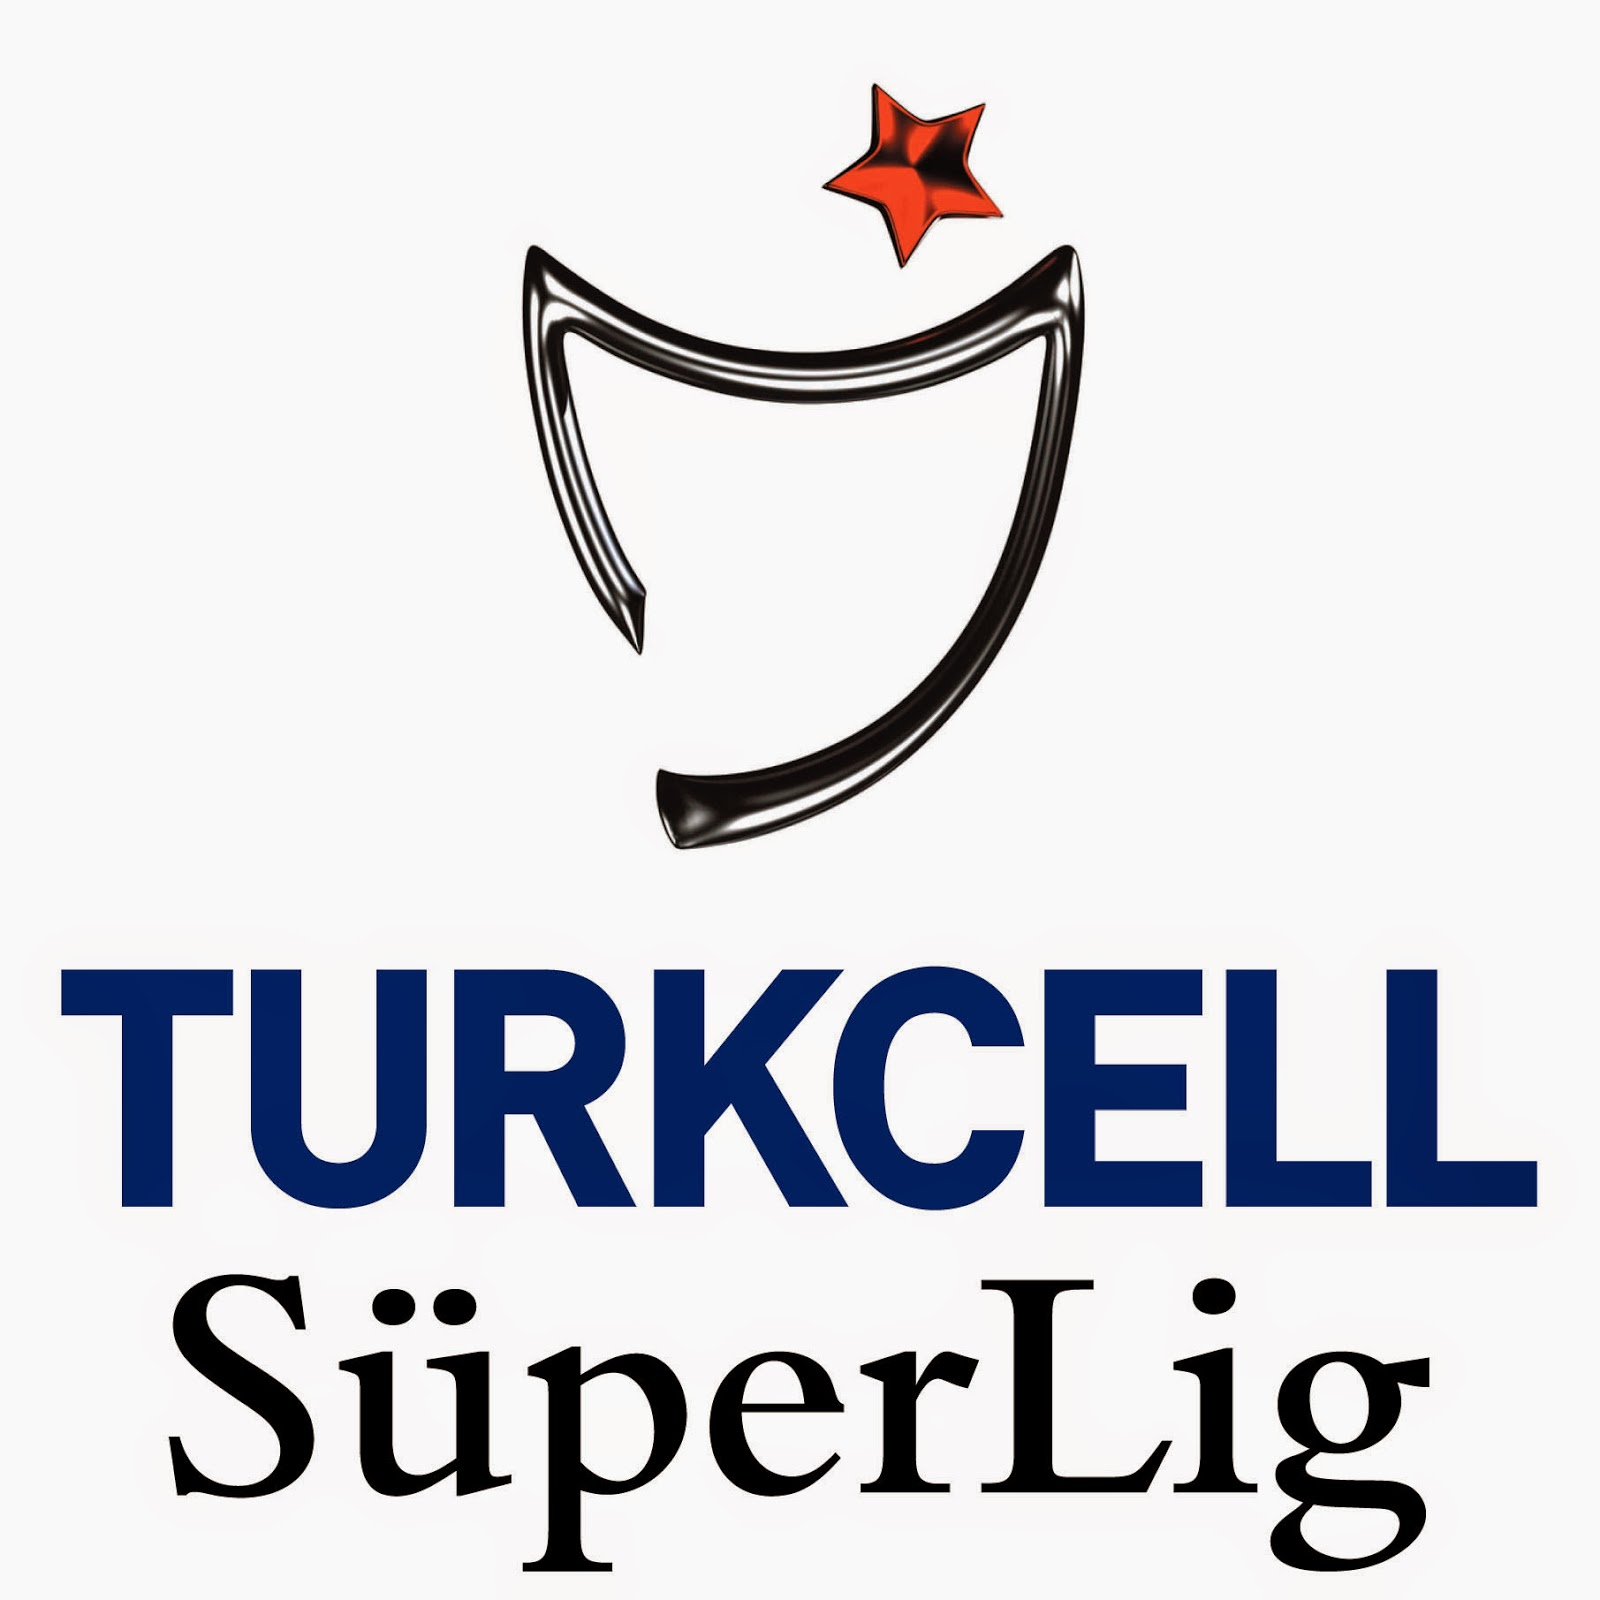 Ставки на футбол на Сивасспор – Генчлербирлиги. Ставки на чемпионат Турции, 28 Апреля 2018